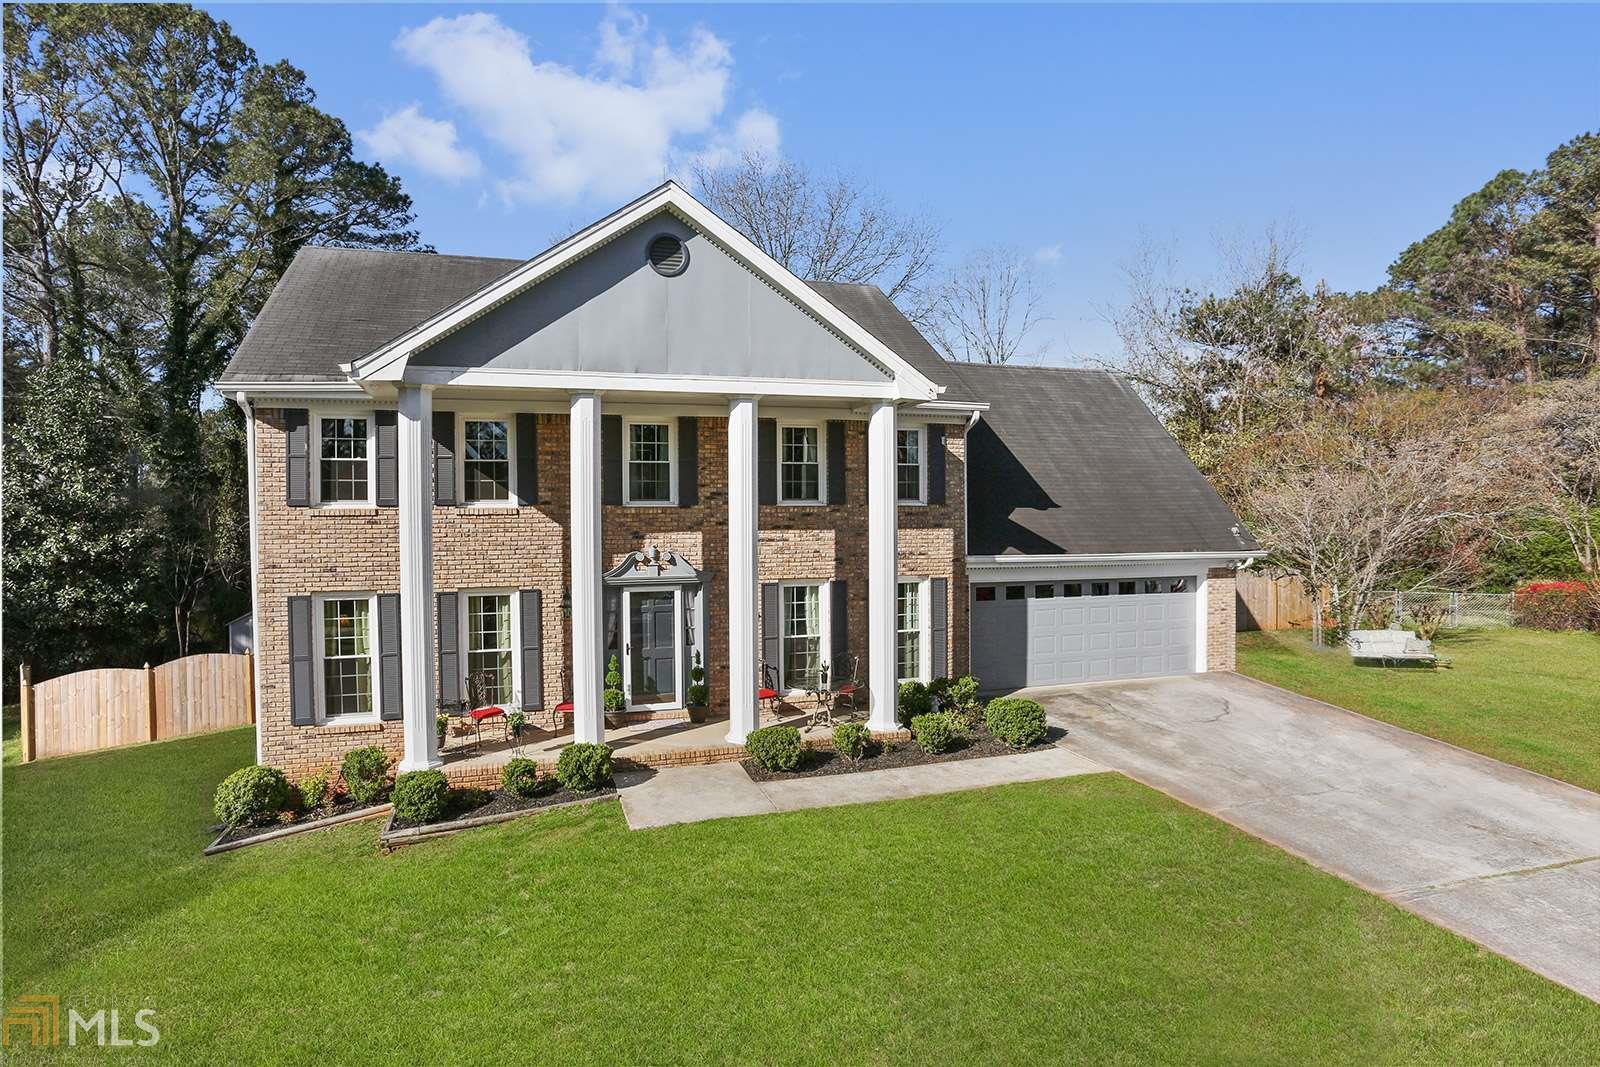 Homes for Sale in Lilburn GA — Lilburn Real Estate — ZipRealty